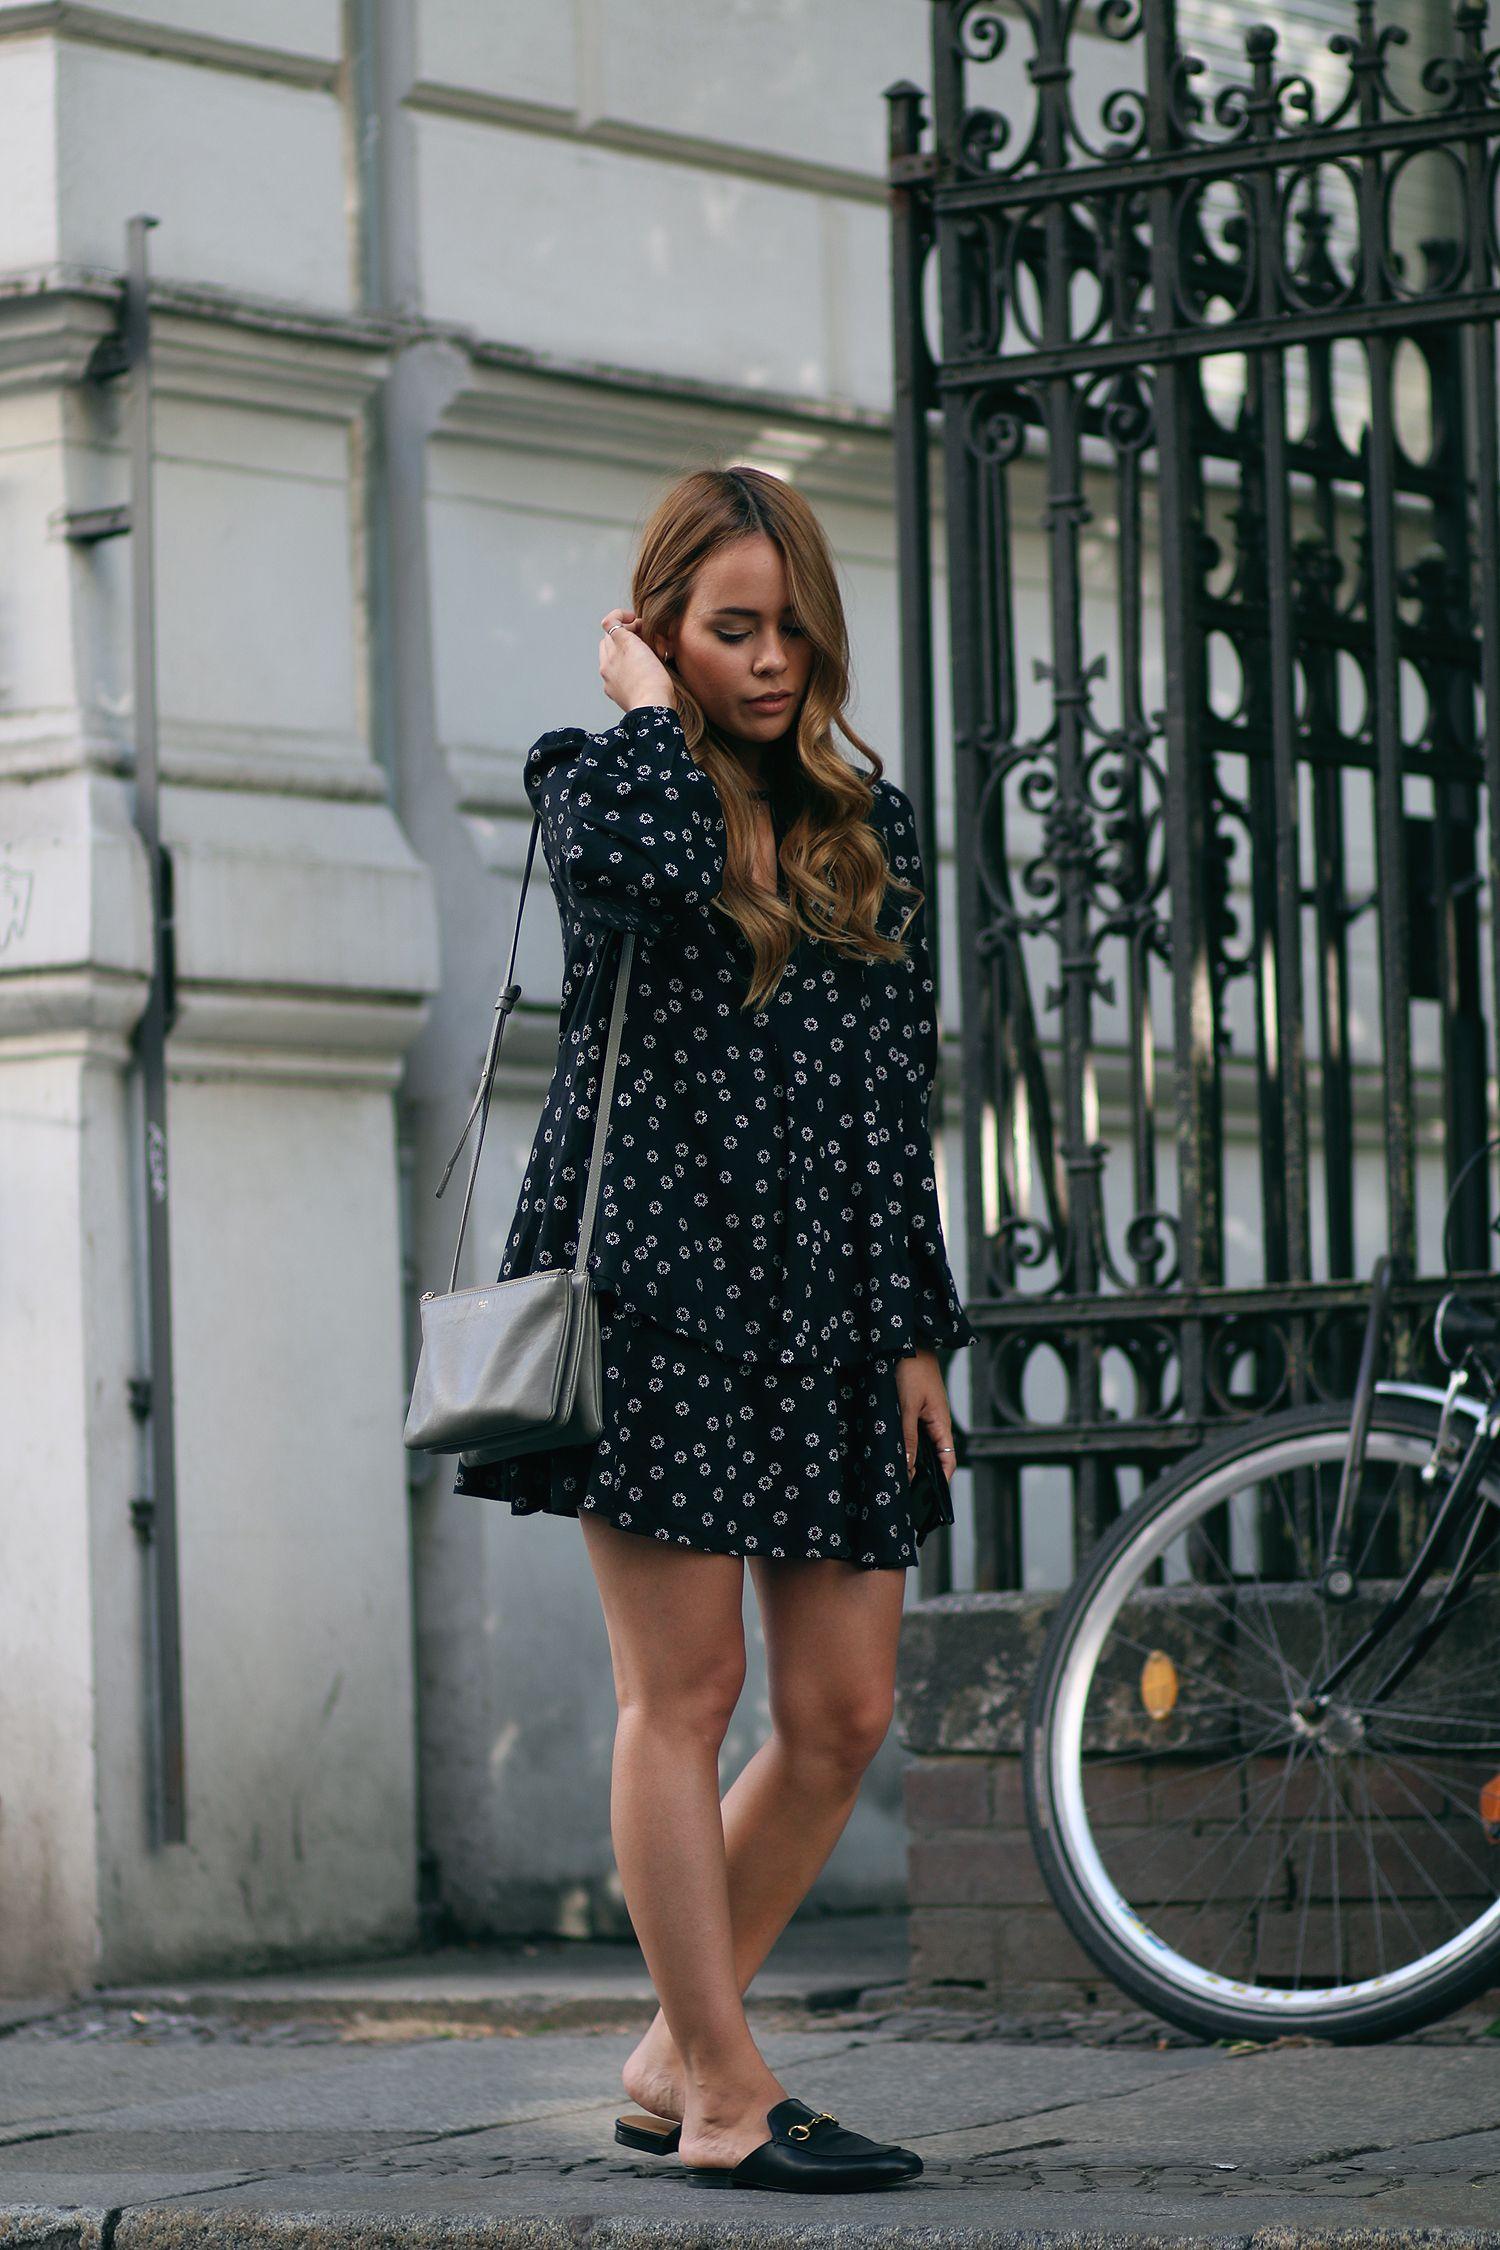 Outfit Gucci Slipper u0026 Flower Dress   cute clothes   Pinterest   Ray ban wayfarer sunglasses ...